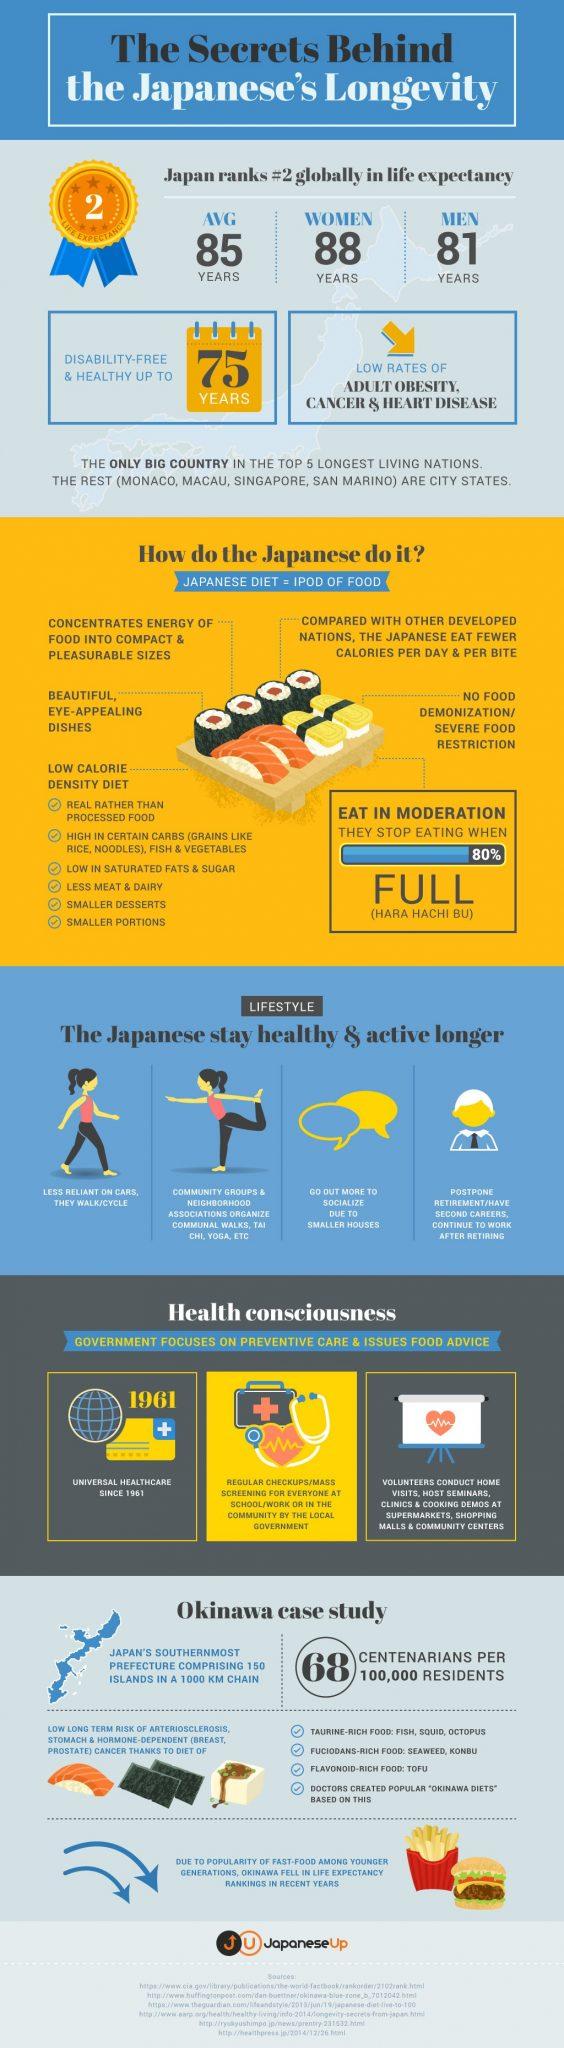 Longevity Diet: The Secrets Behind the Japanese's Longevity | JapaneseUp